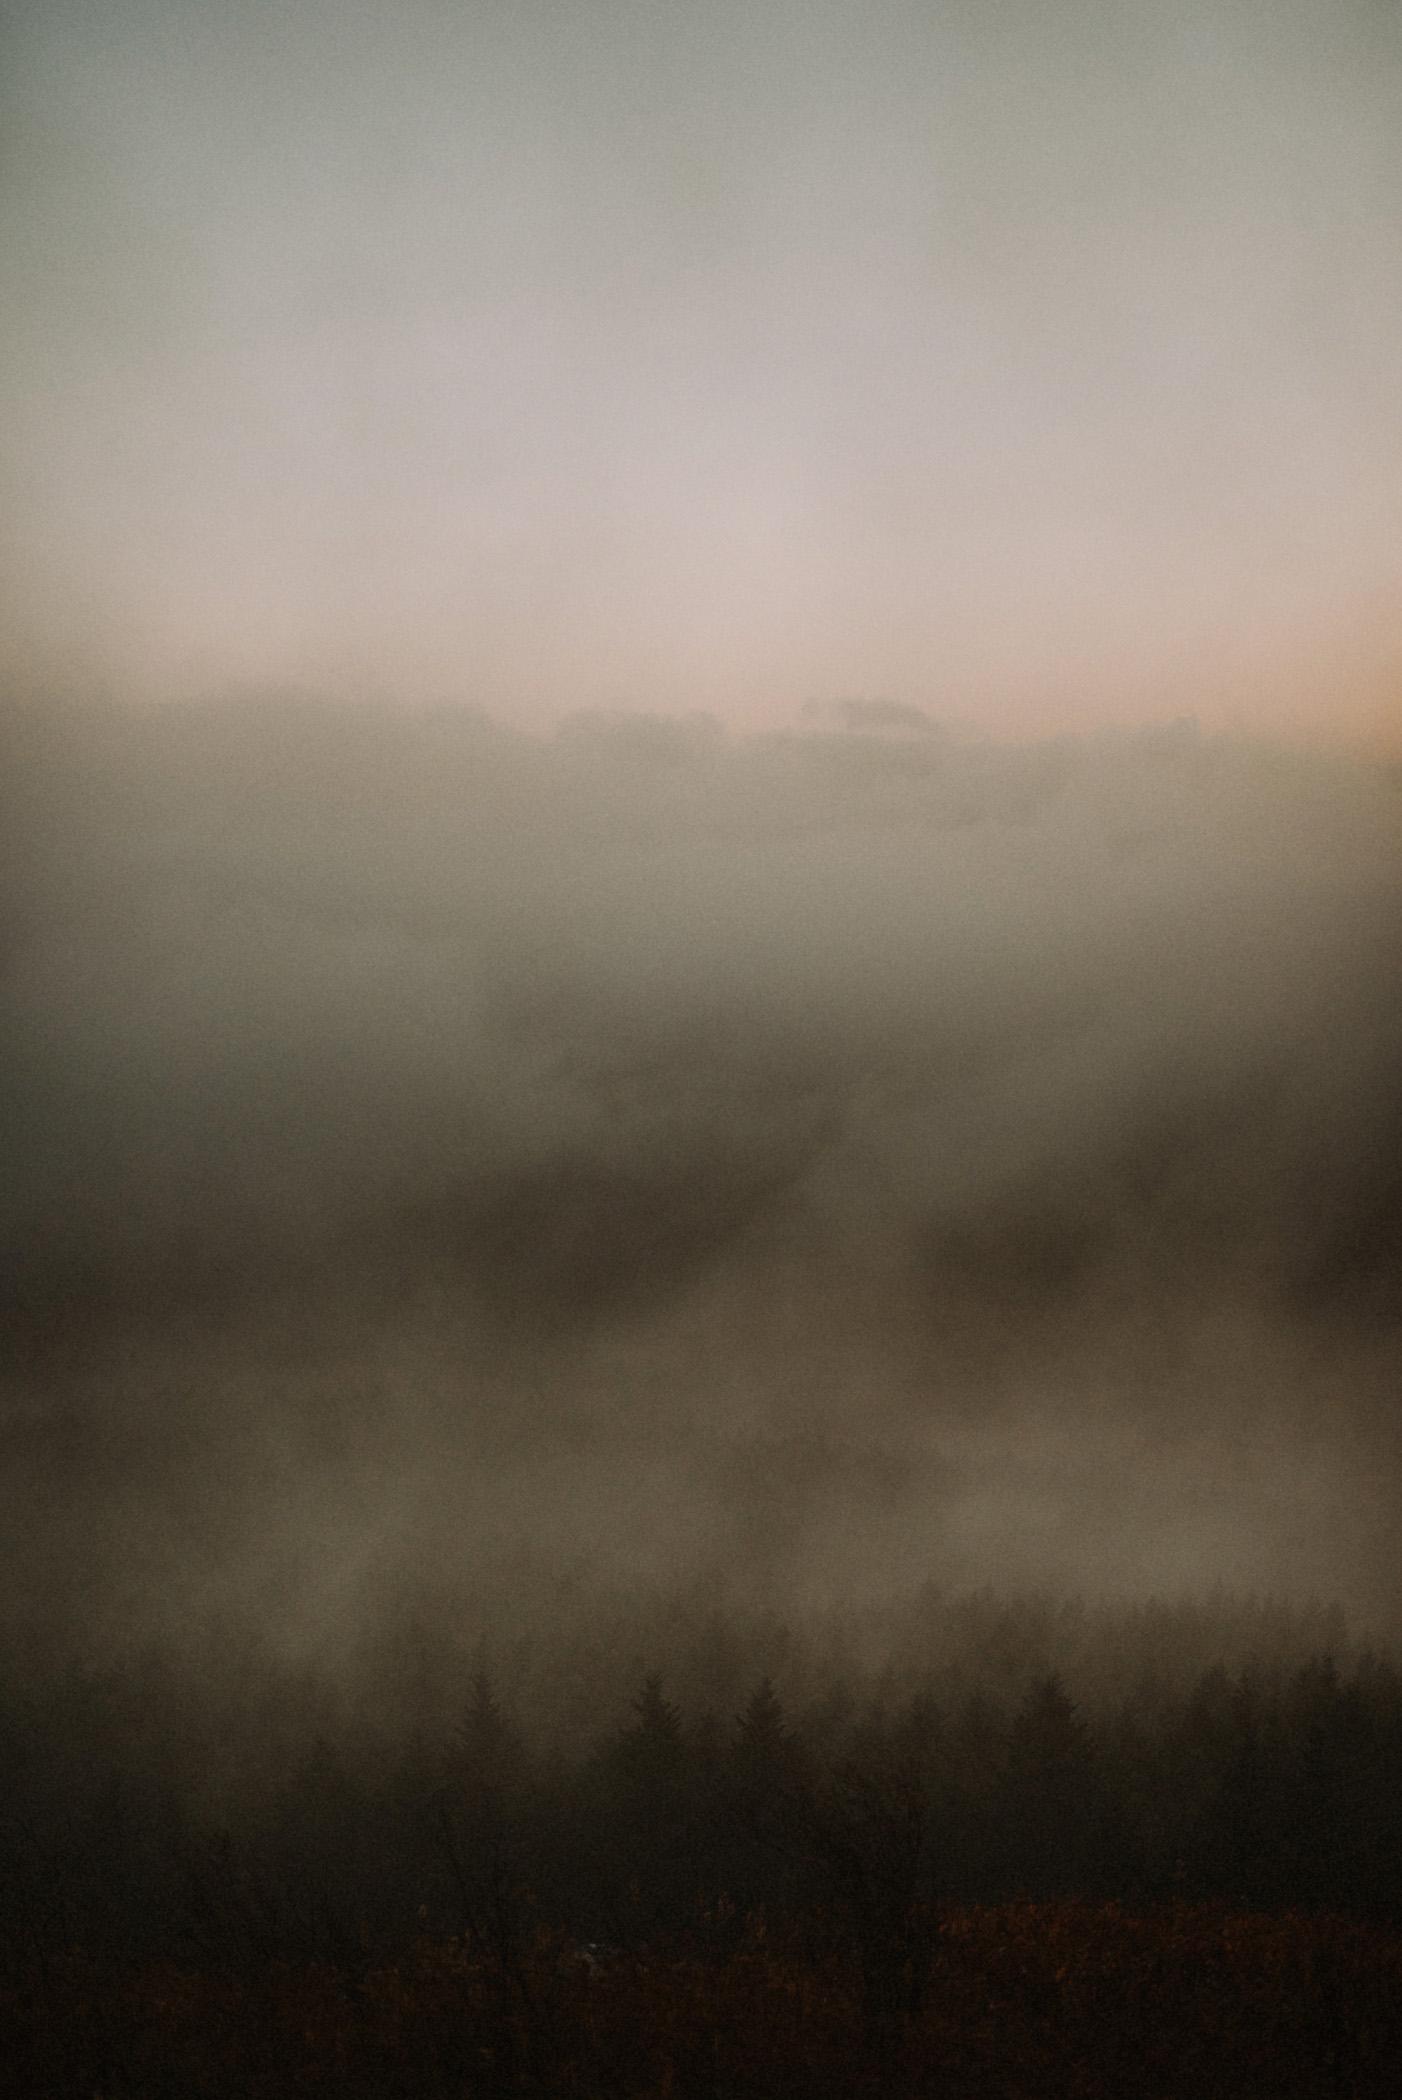 Sunrise+Engagement+Adventure+Hiking+Session+in+the+Blue+Ridge+Smoky+Mountains.jpeg